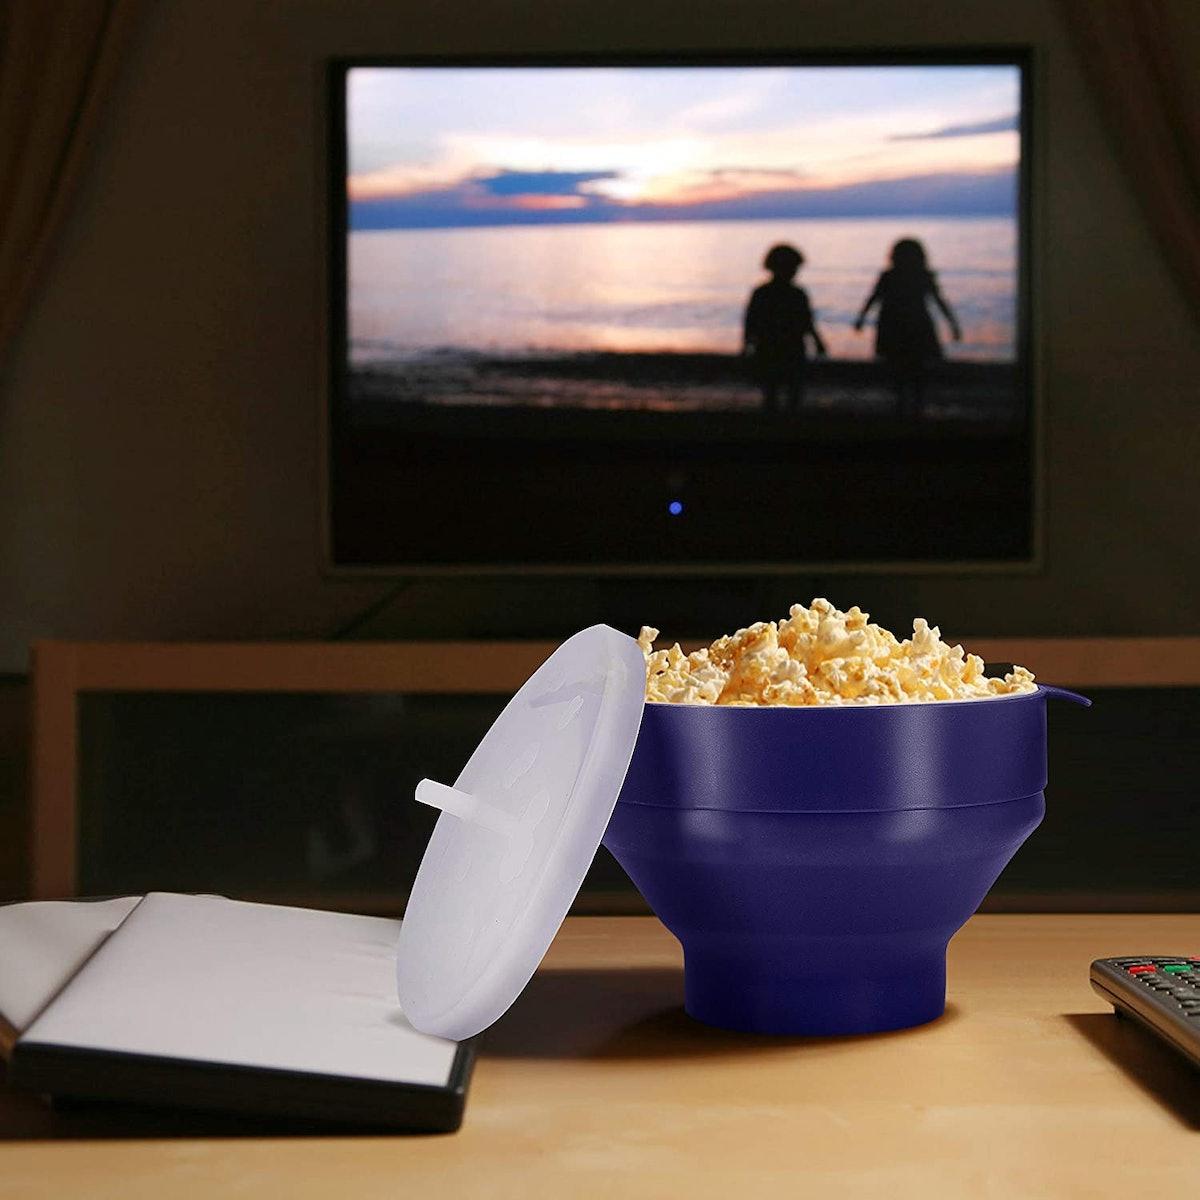 Original Microwaveable Silicone Popcorn Popper